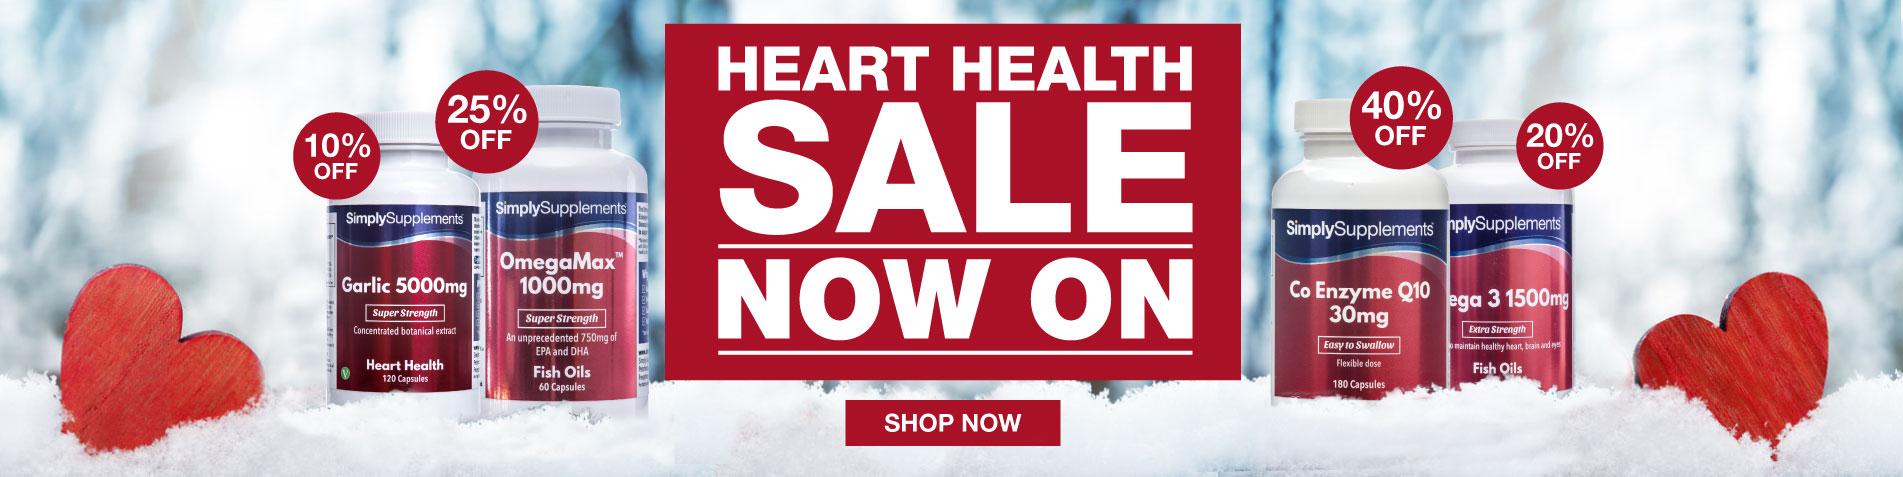 Heart Health Sale